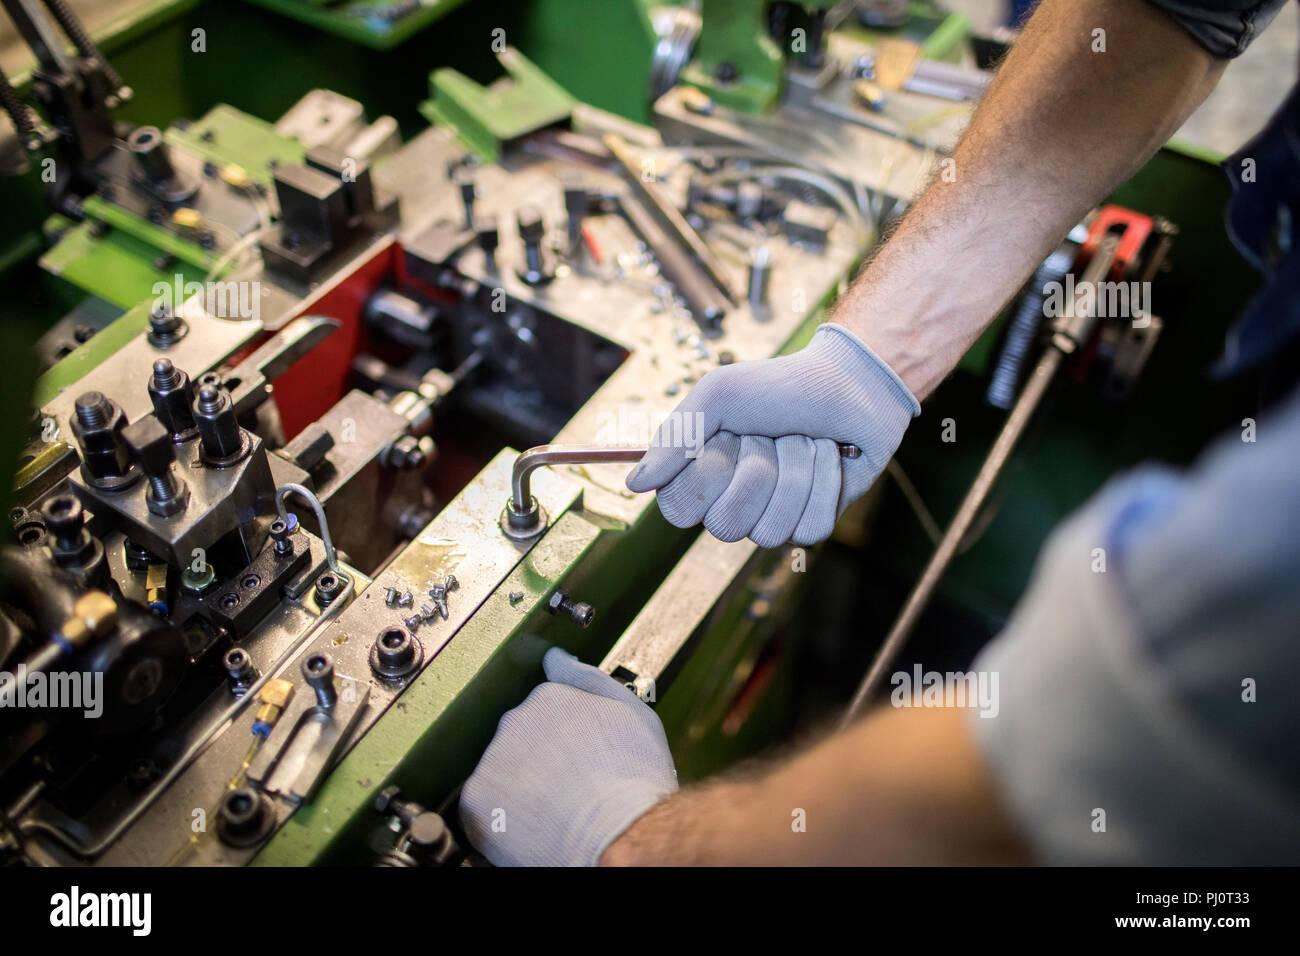 Working on machine - Stock Image